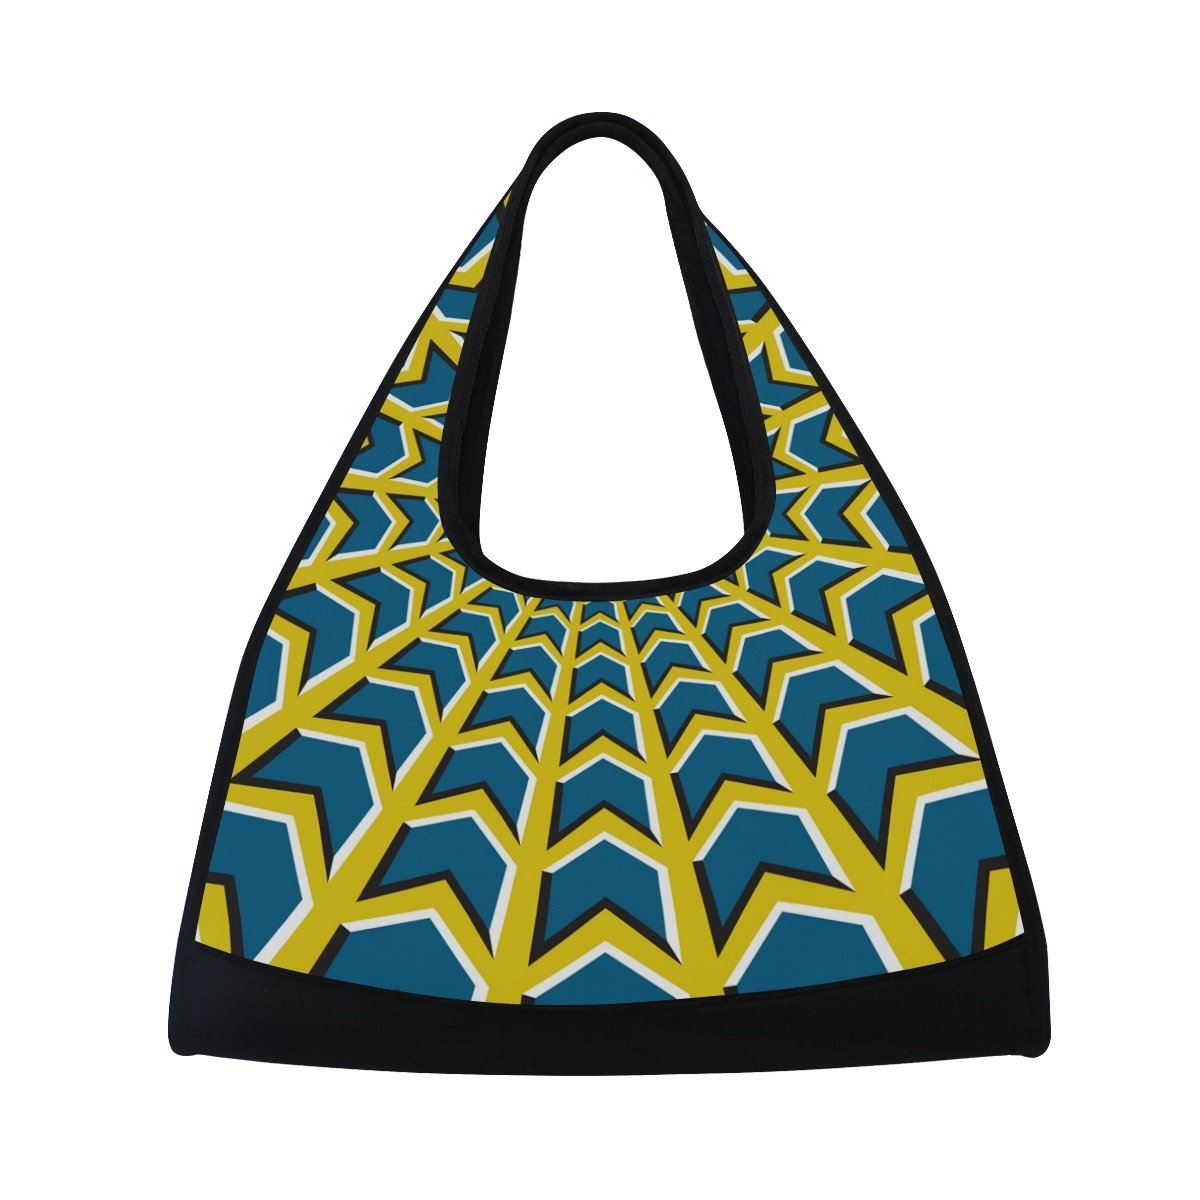 AHOMY Canvas Sports Gym Bag Colorful Ring Grid Pattern Travel Shoulder Bag